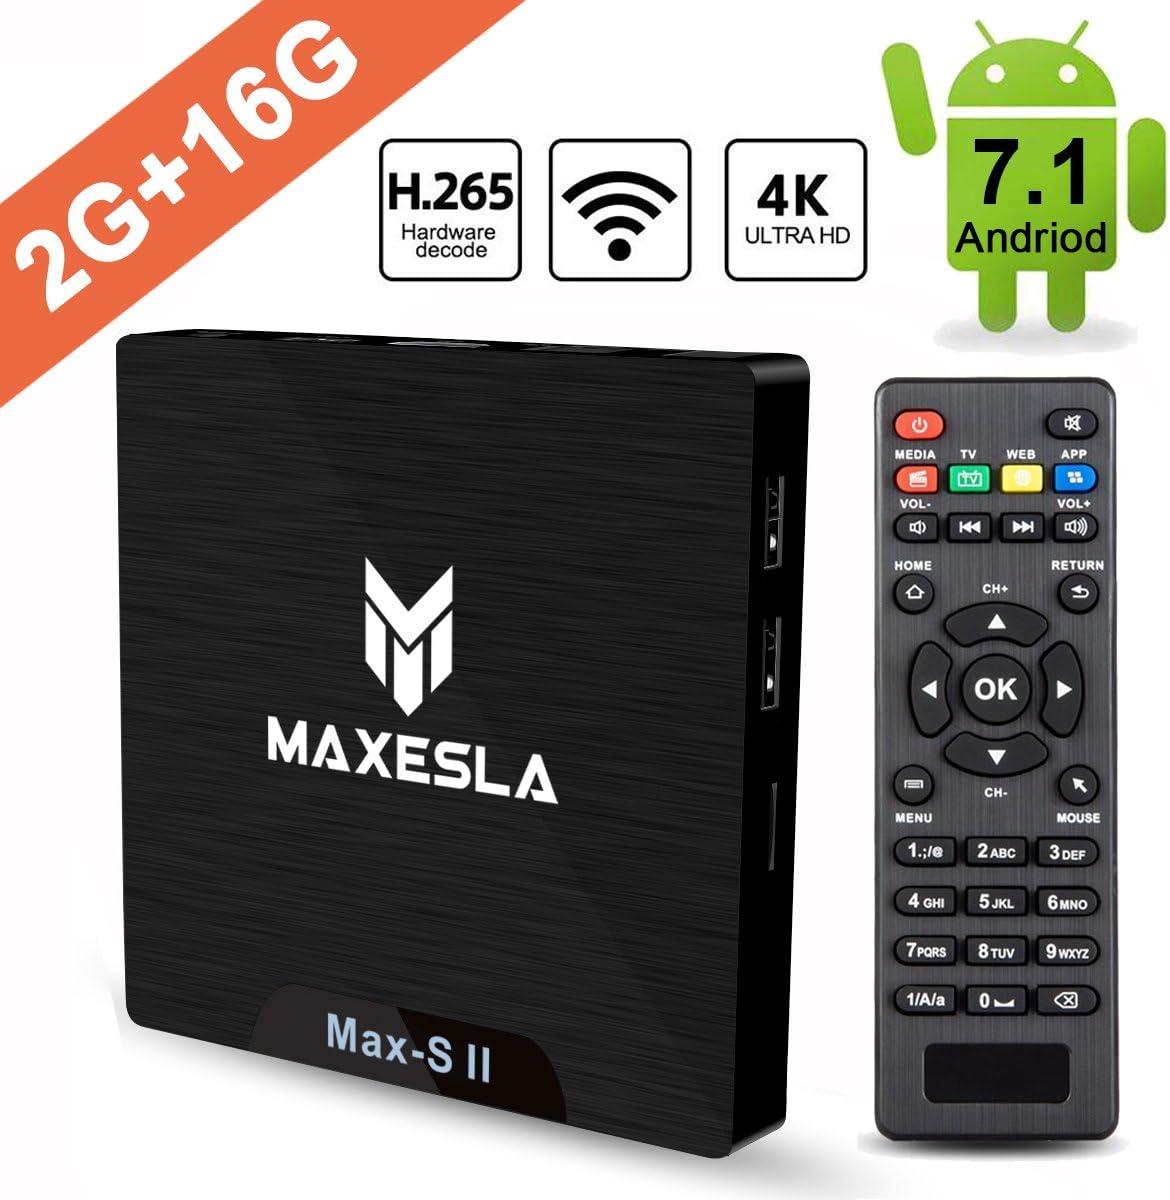 Smart TV Box Android 7.1 - Maxesla MAX-S II Mini TV Box de 2GB RAM + 16GB ROM, 2018 Última CPU Amlogic S905W, WiFi 2.4GHz, Doble USB, H.265, HDMI & AV, 4K